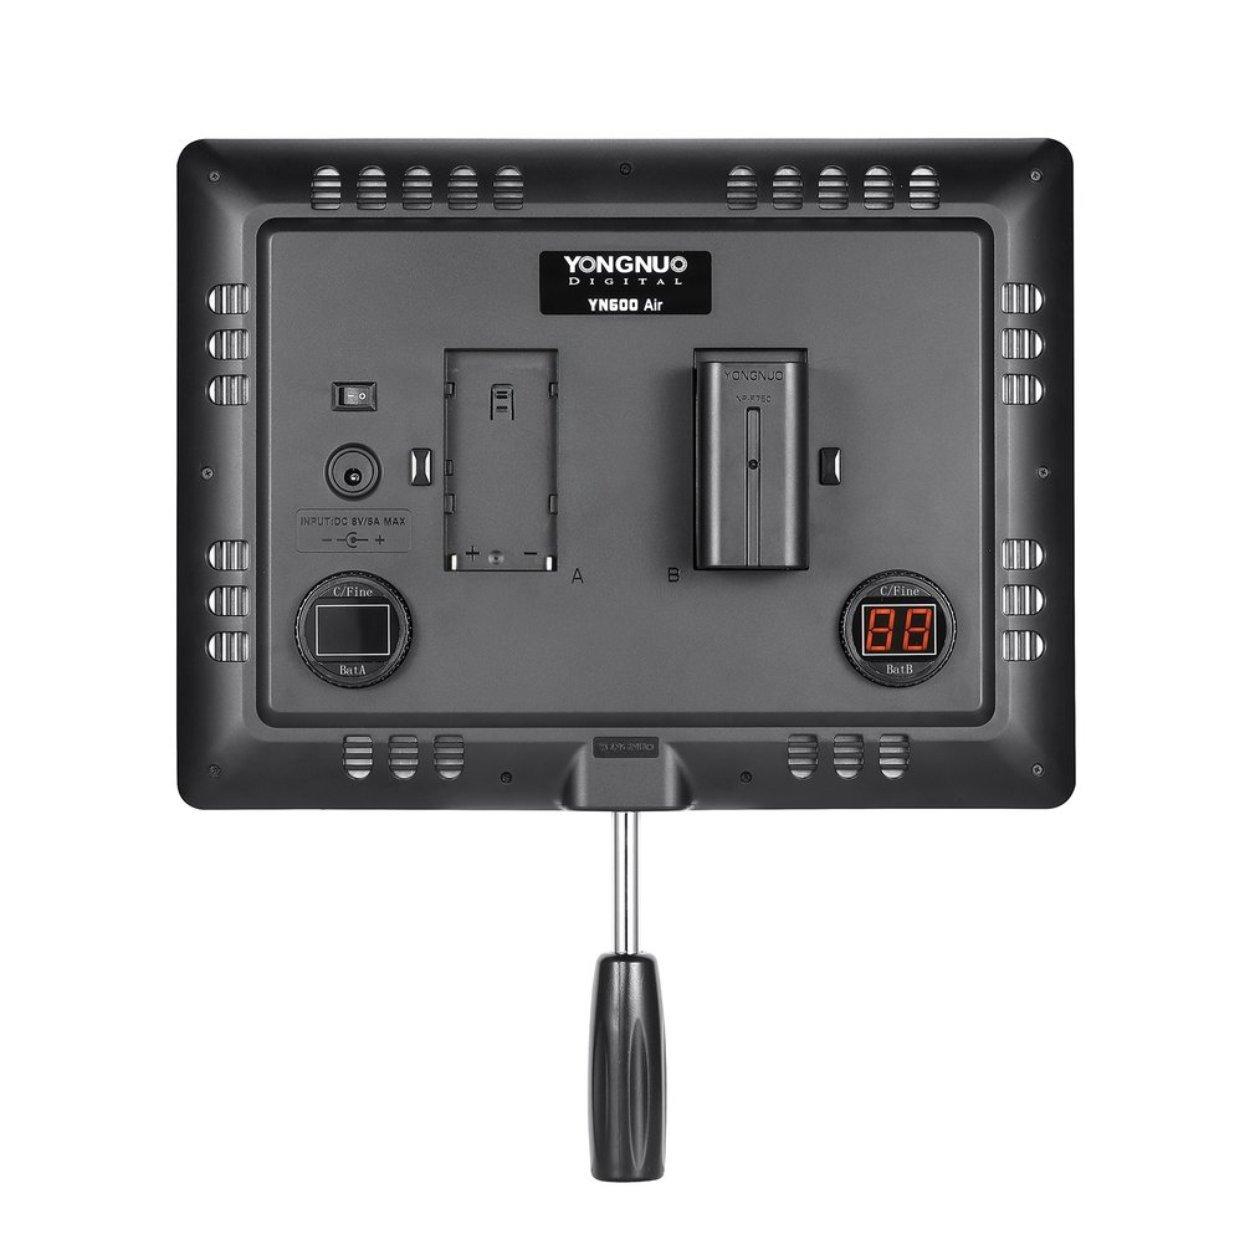 YN600 Air Ultra Thin LED Camera Video Light Photography Studio Lighting Lamp B07KM21T44